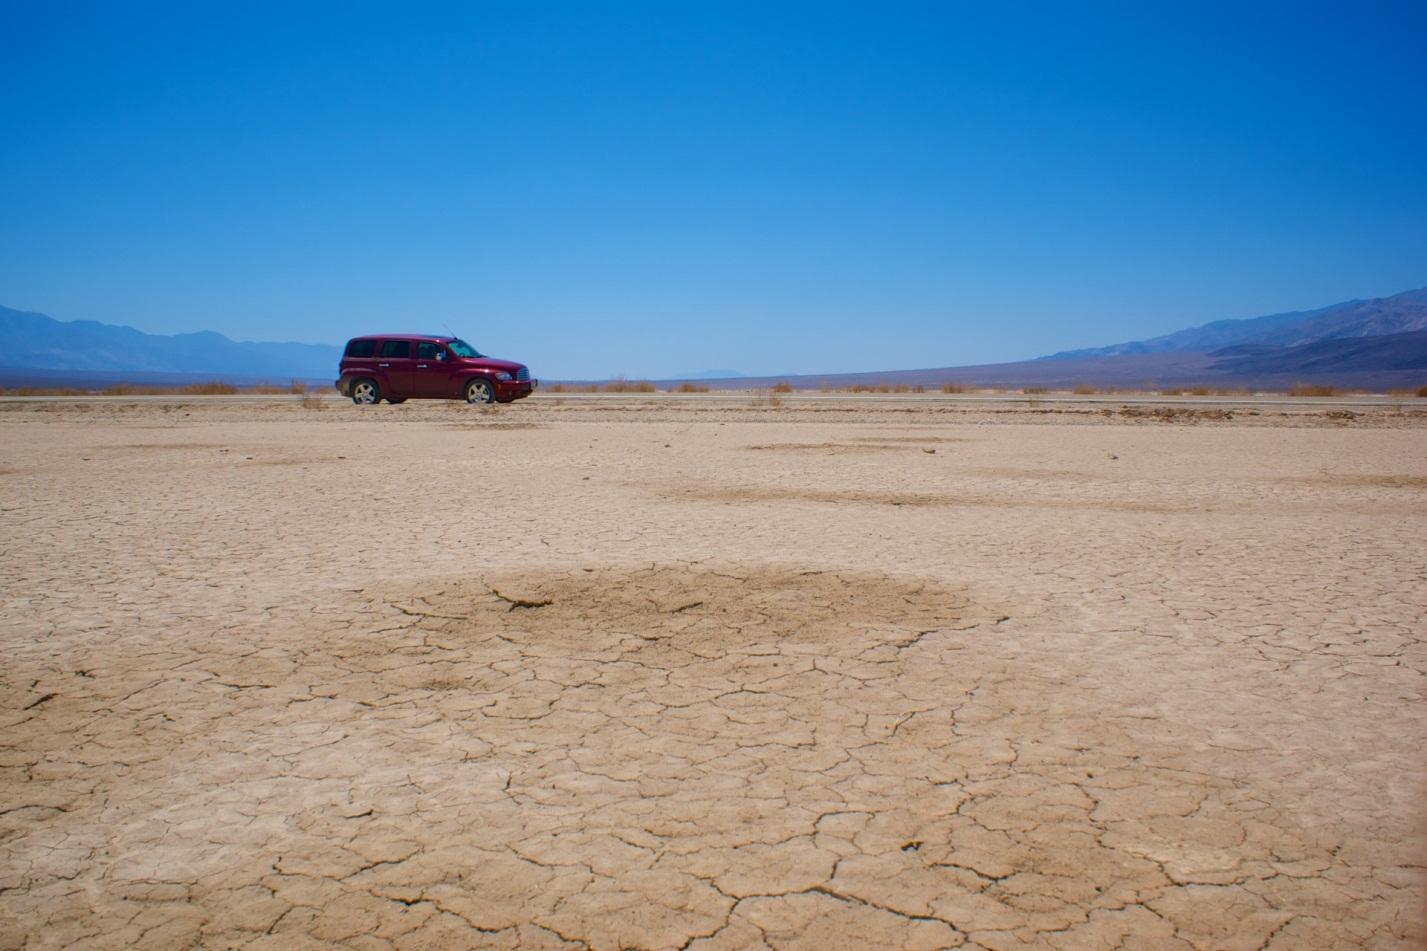 C:\Users\user\Desktop\car-in-mojave-desert.jpg